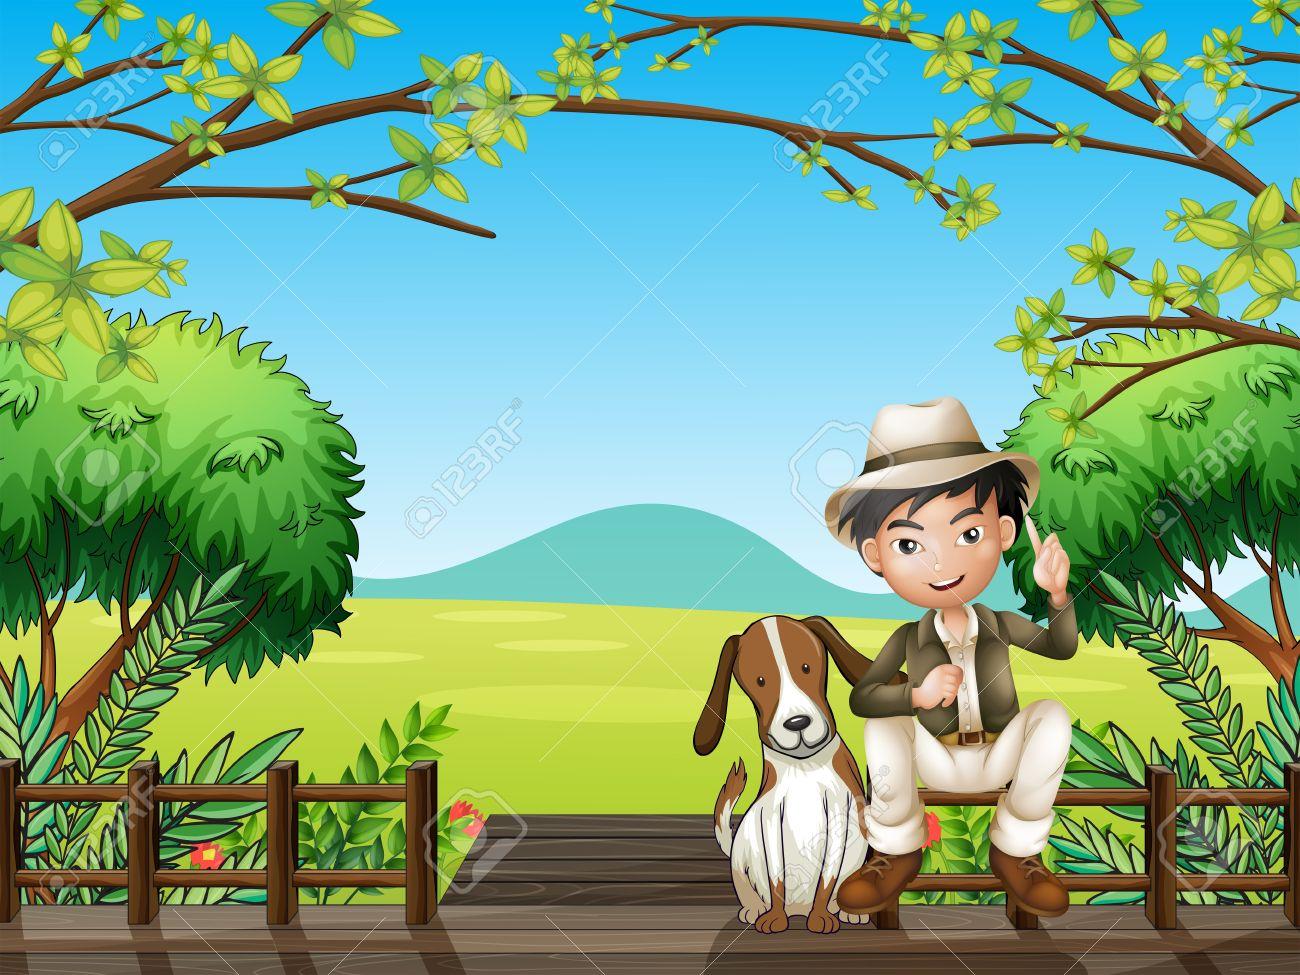 Illustration of a smiling boy and a dog sitting on a wooden platform - 17896751